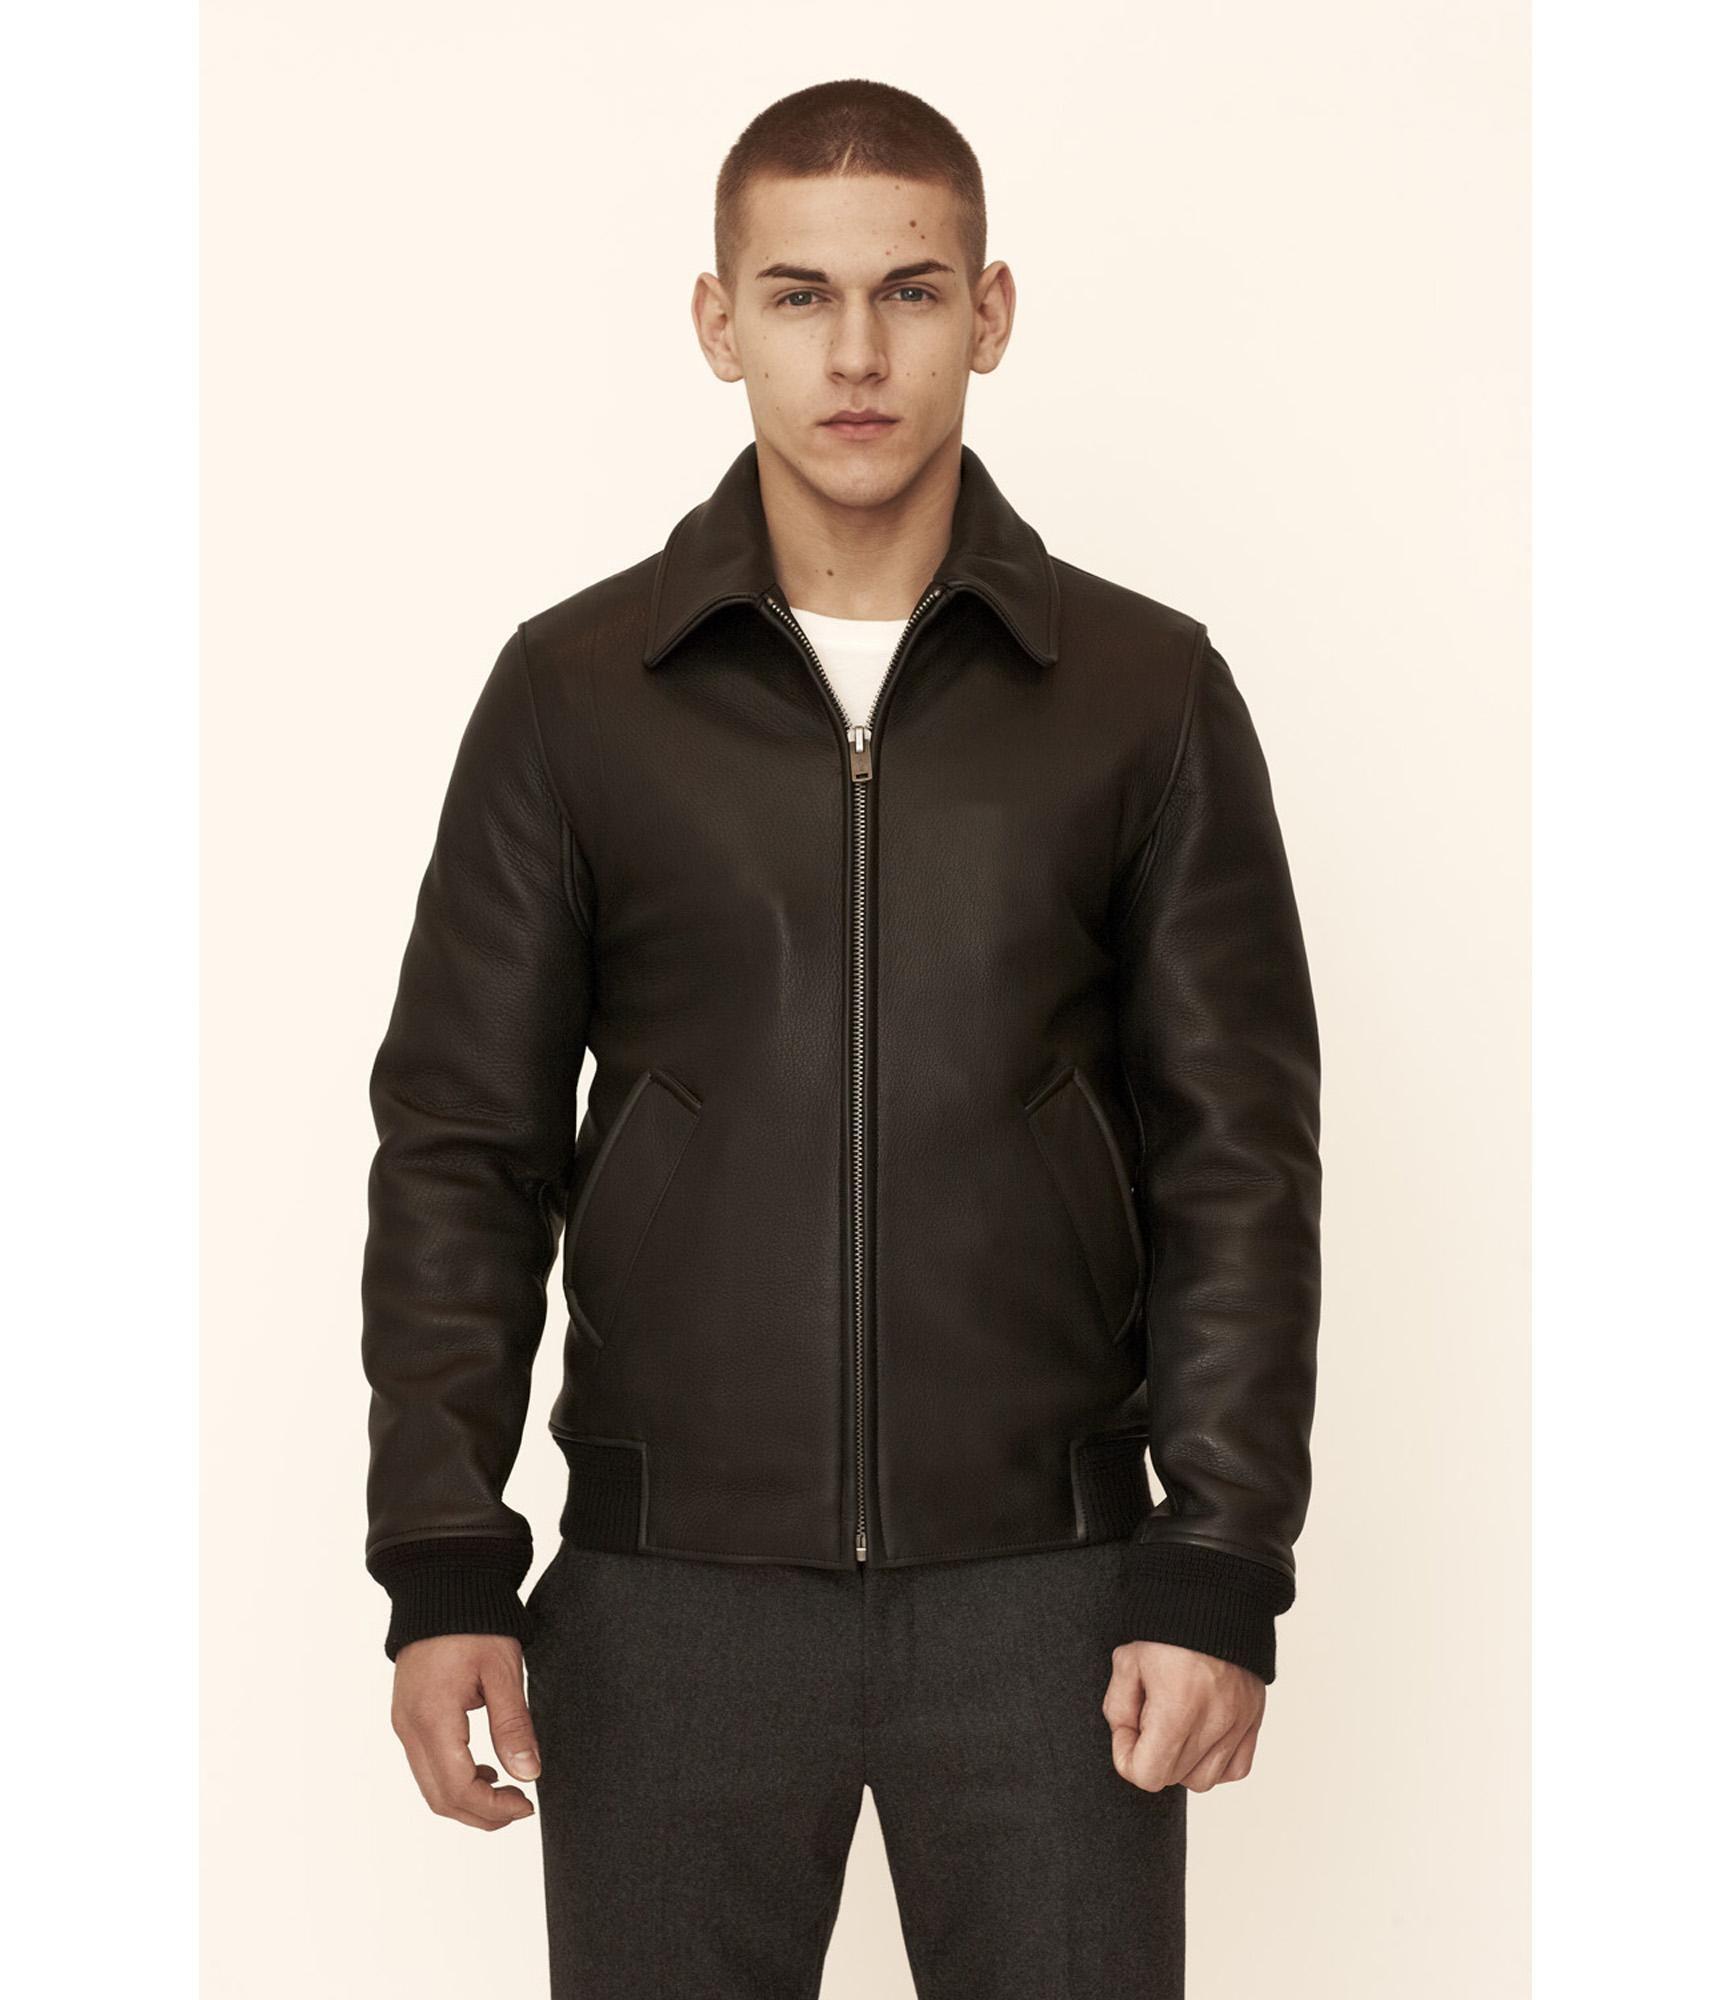 A P C Store Police Jacket Leather Jacket Black Jackets [ 2000 x 1732 Pixel ]